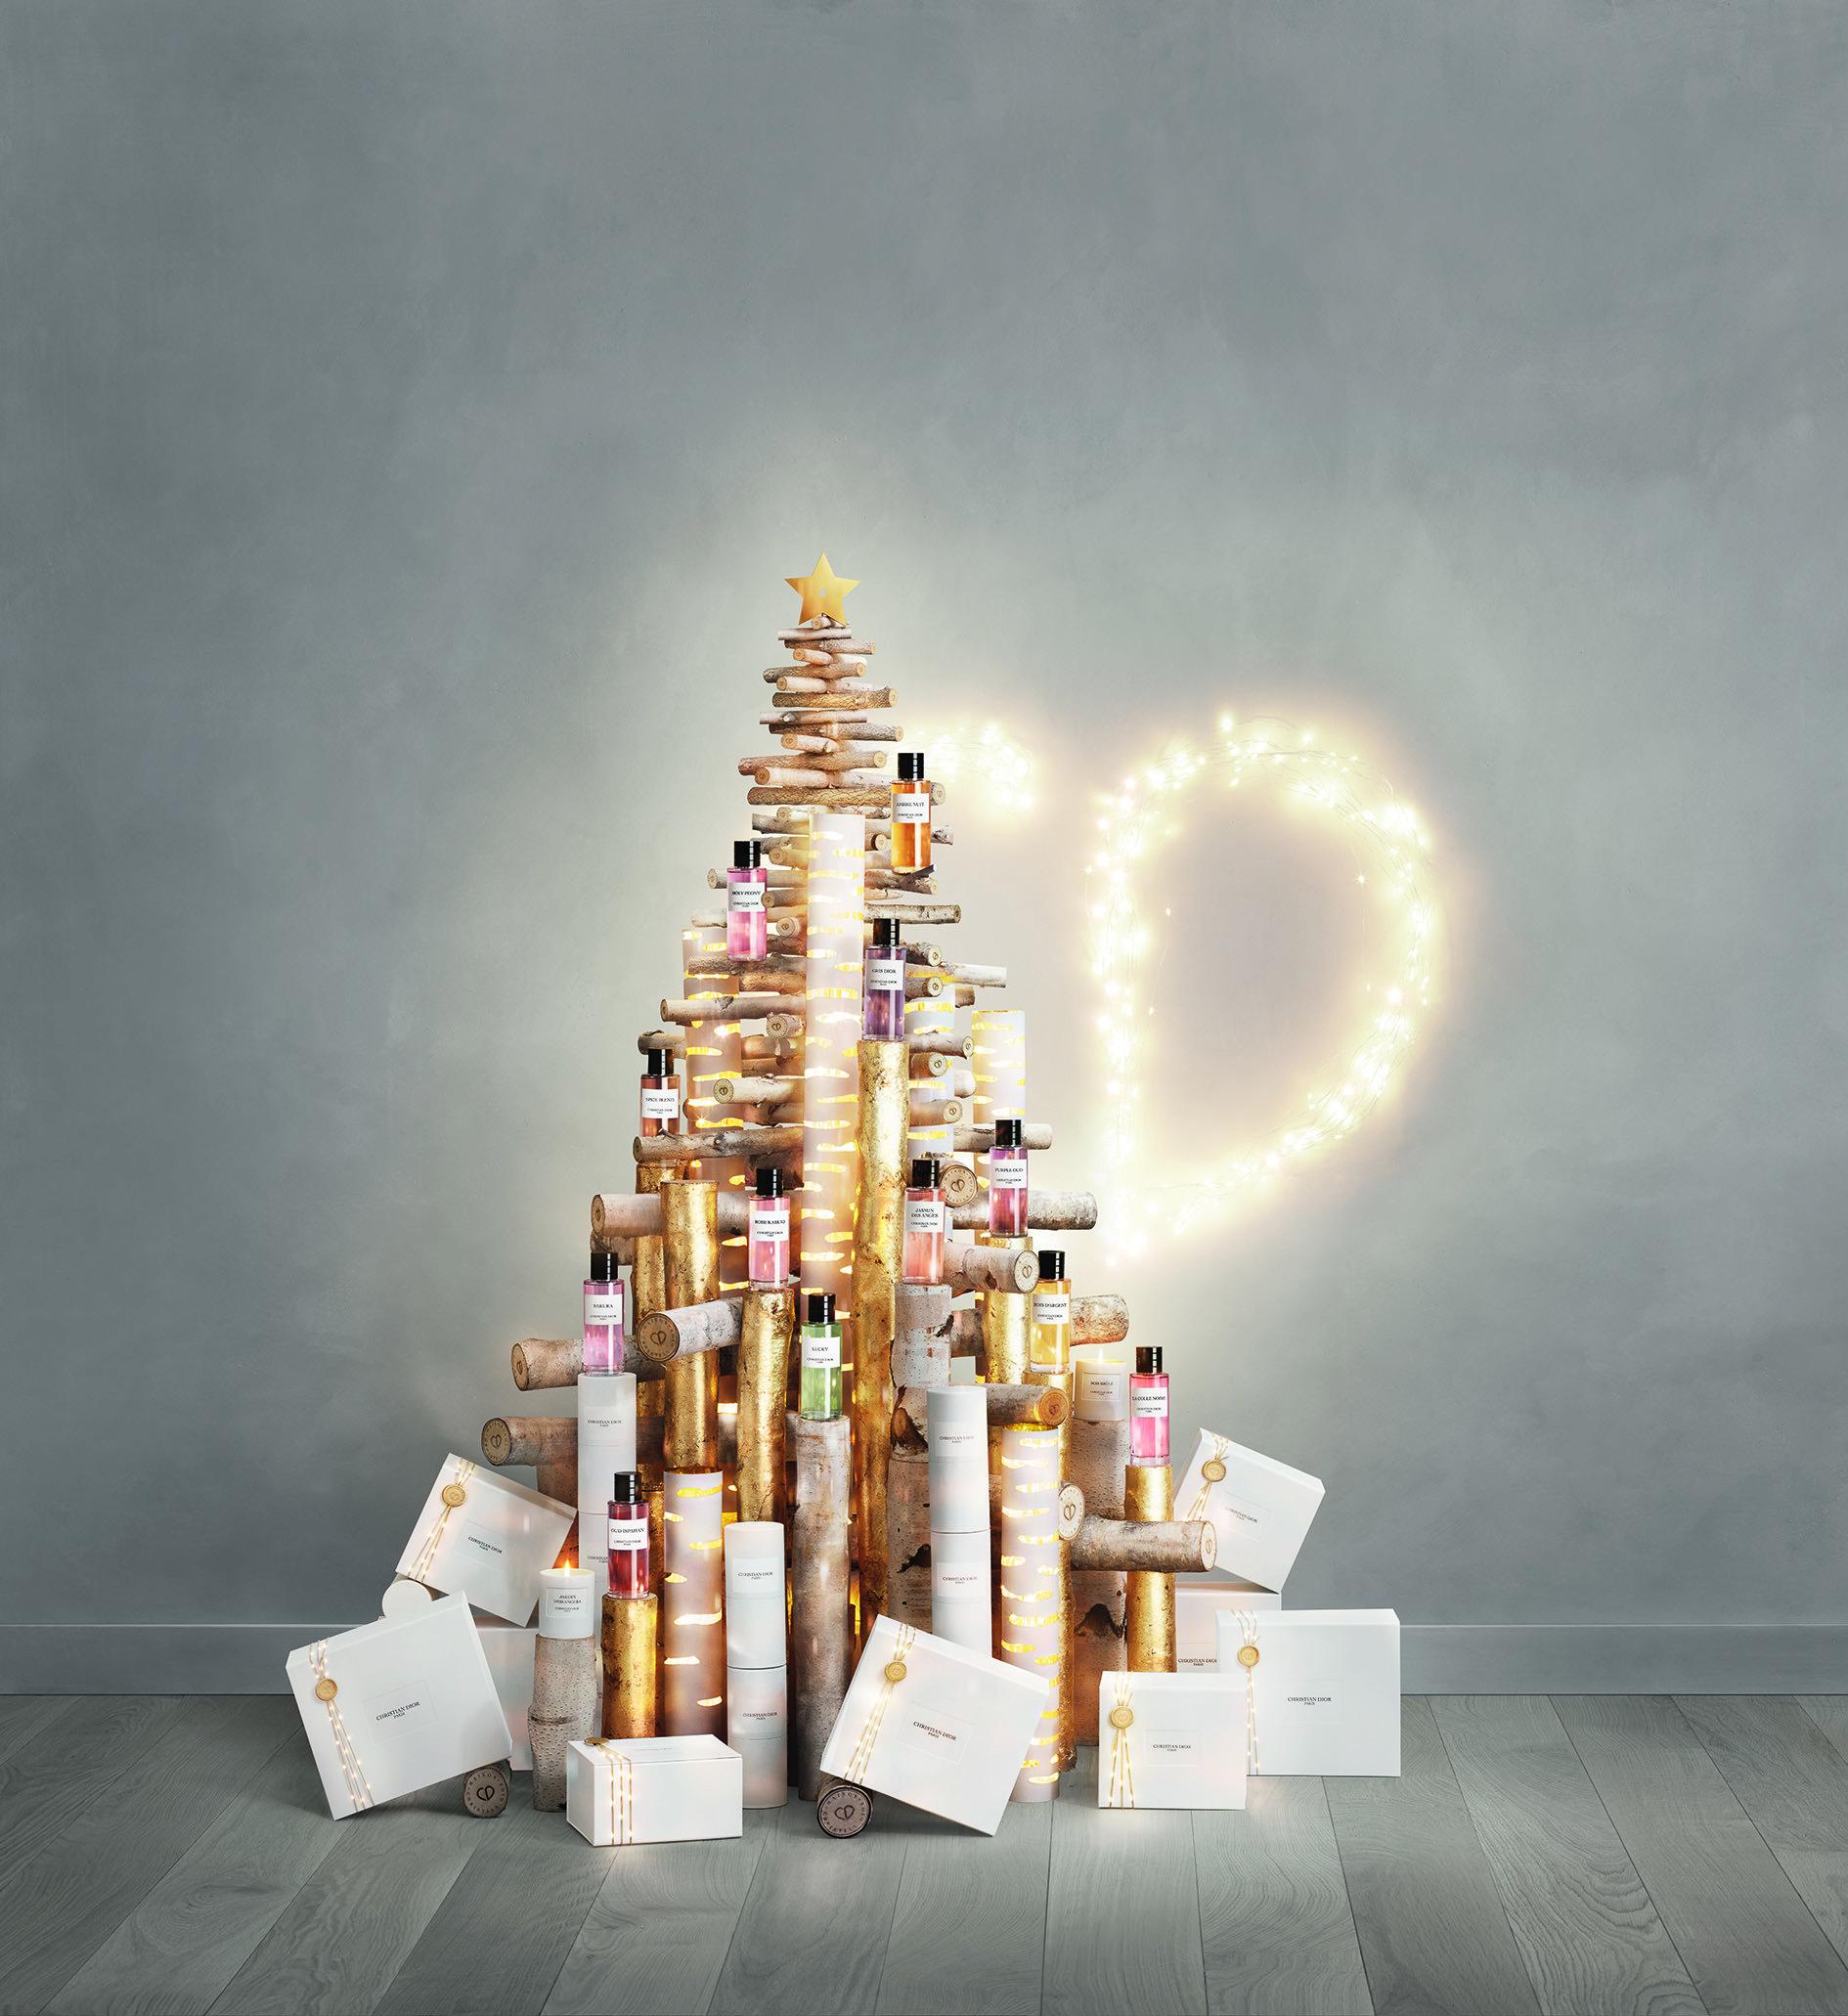 ▲Dior聖誕倒數月曆首曝「頂級訂製香氛」。(圖/記者張毓容攝)